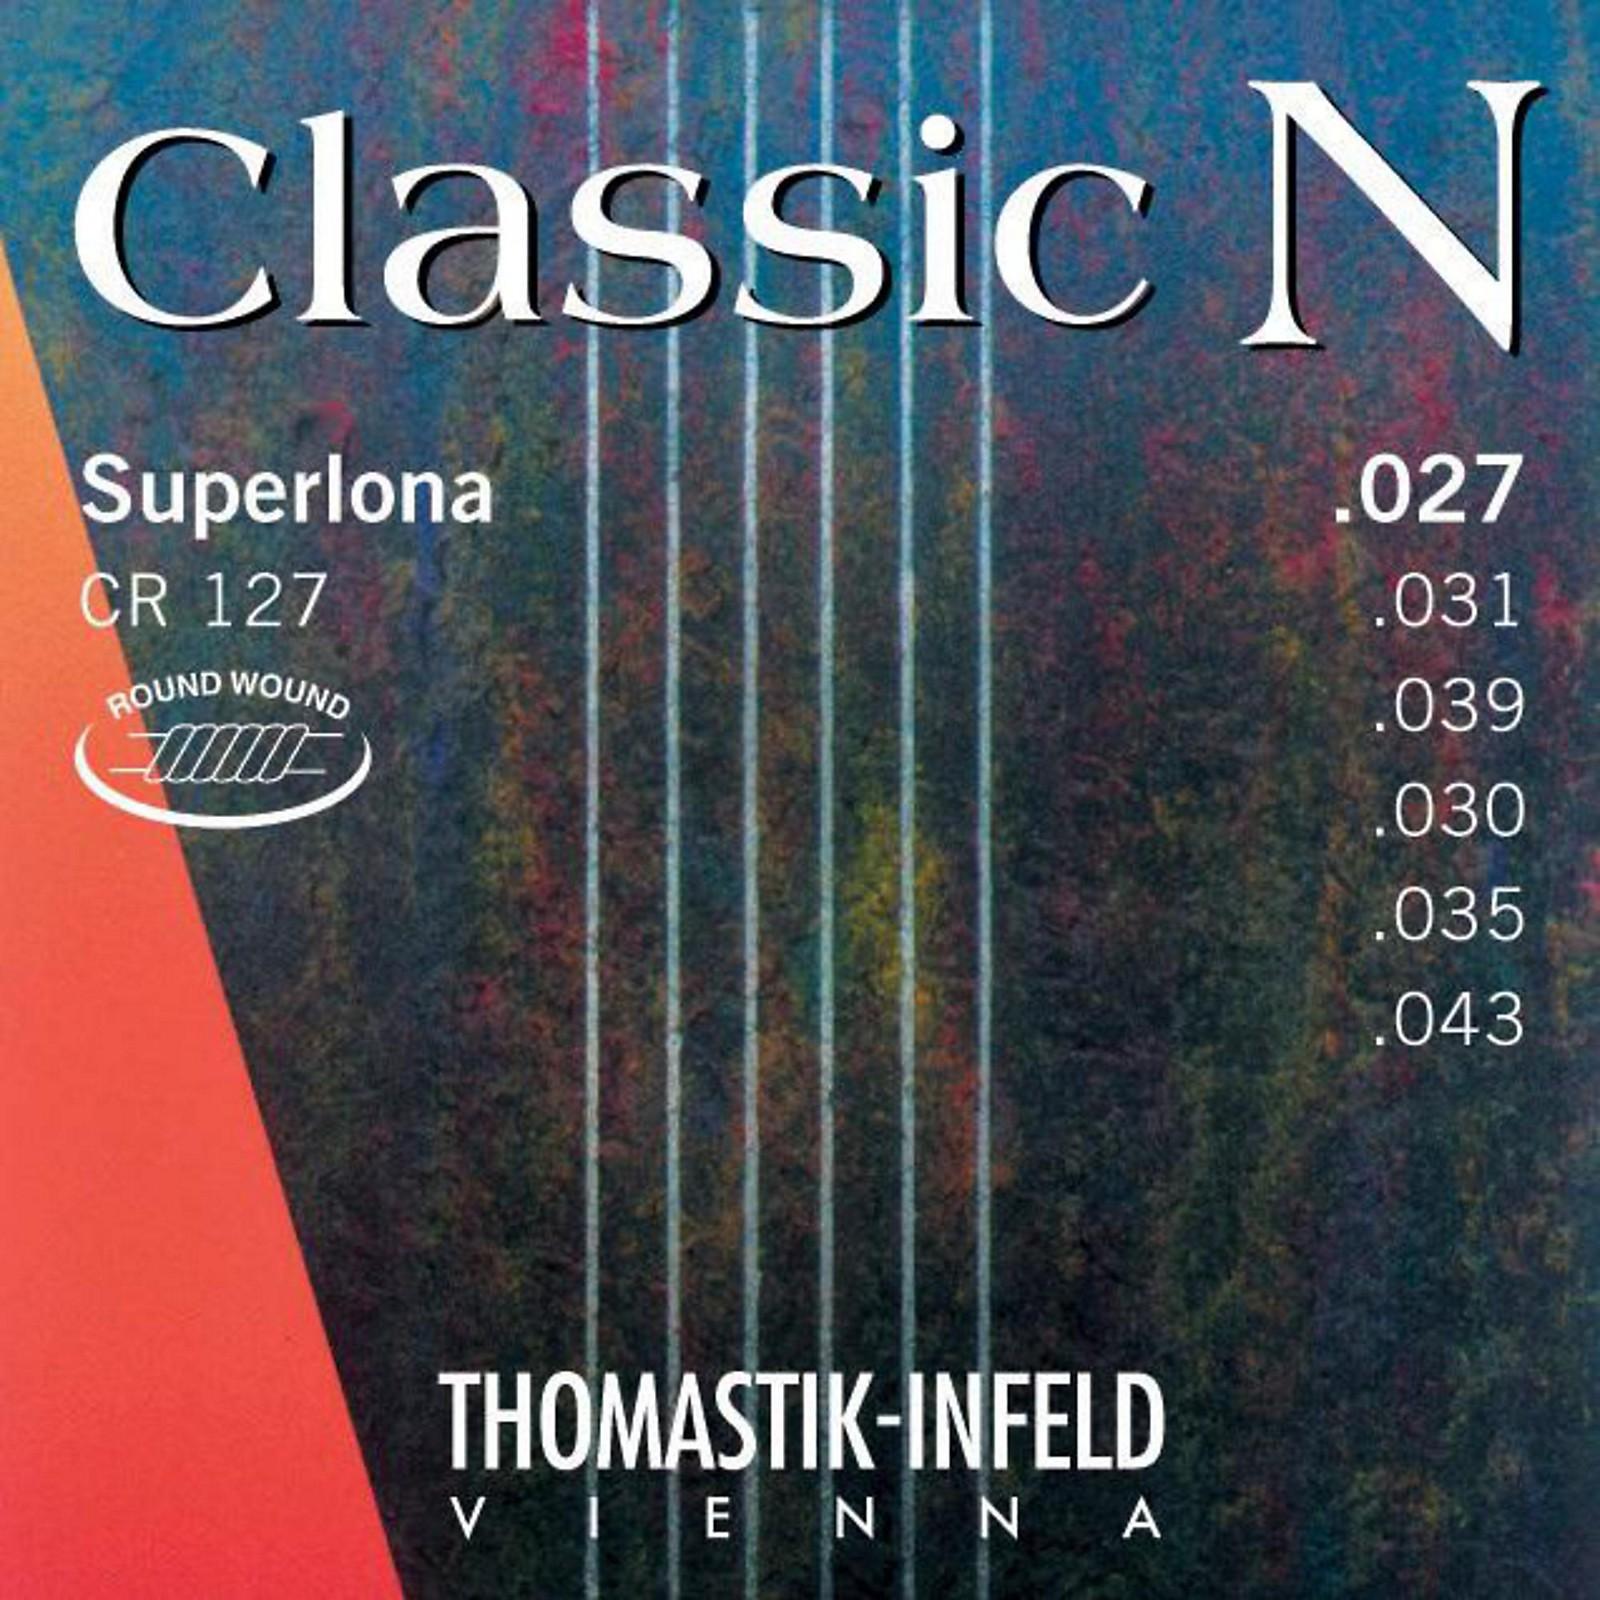 Thomastik CF127 N Series Nylon Guitar Strings - Normal Tension